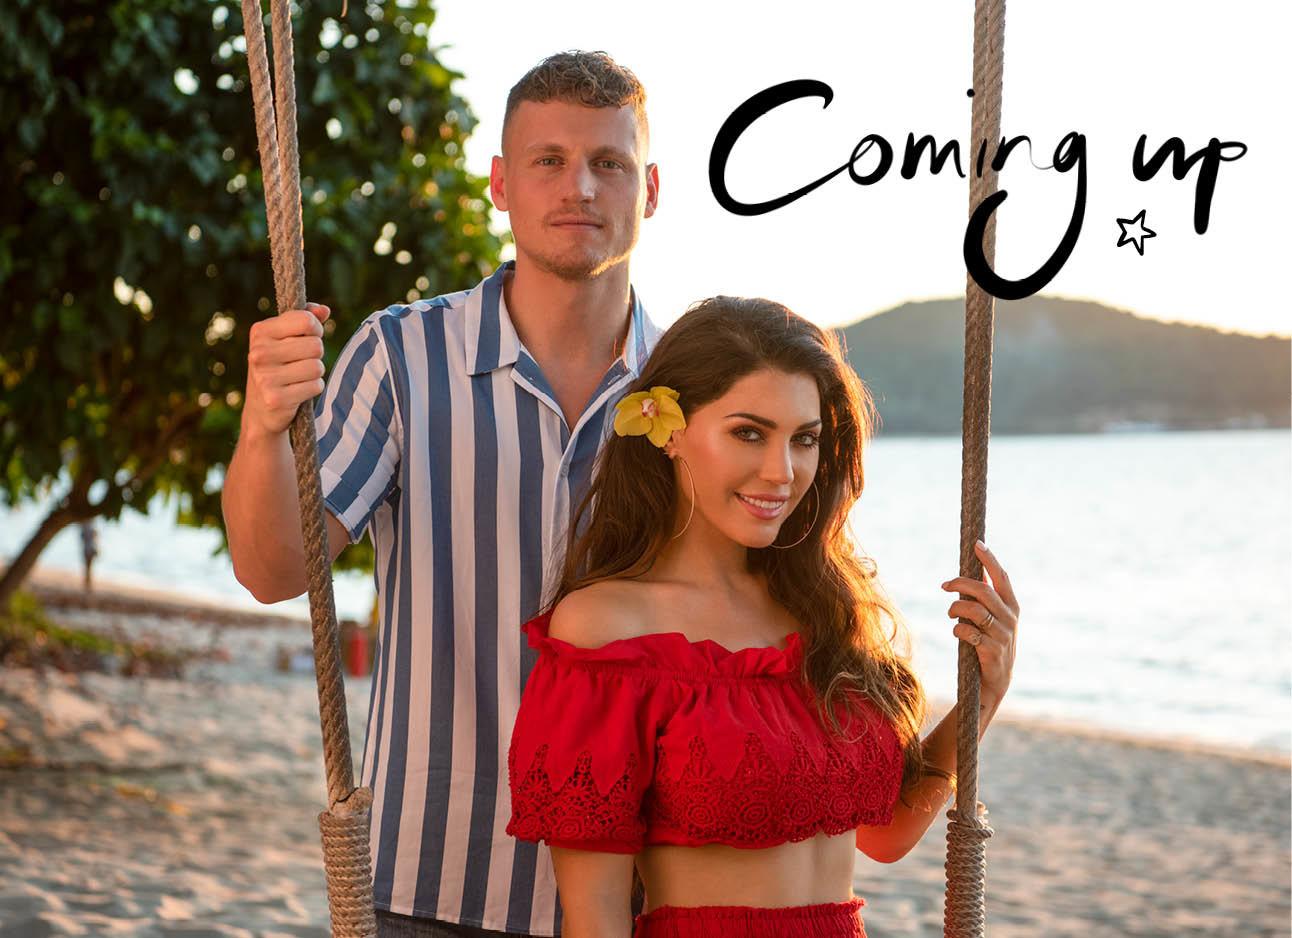 kaj gorgels en yolanthe cabau presenteren het nieuwe seizoen van temptation island vips